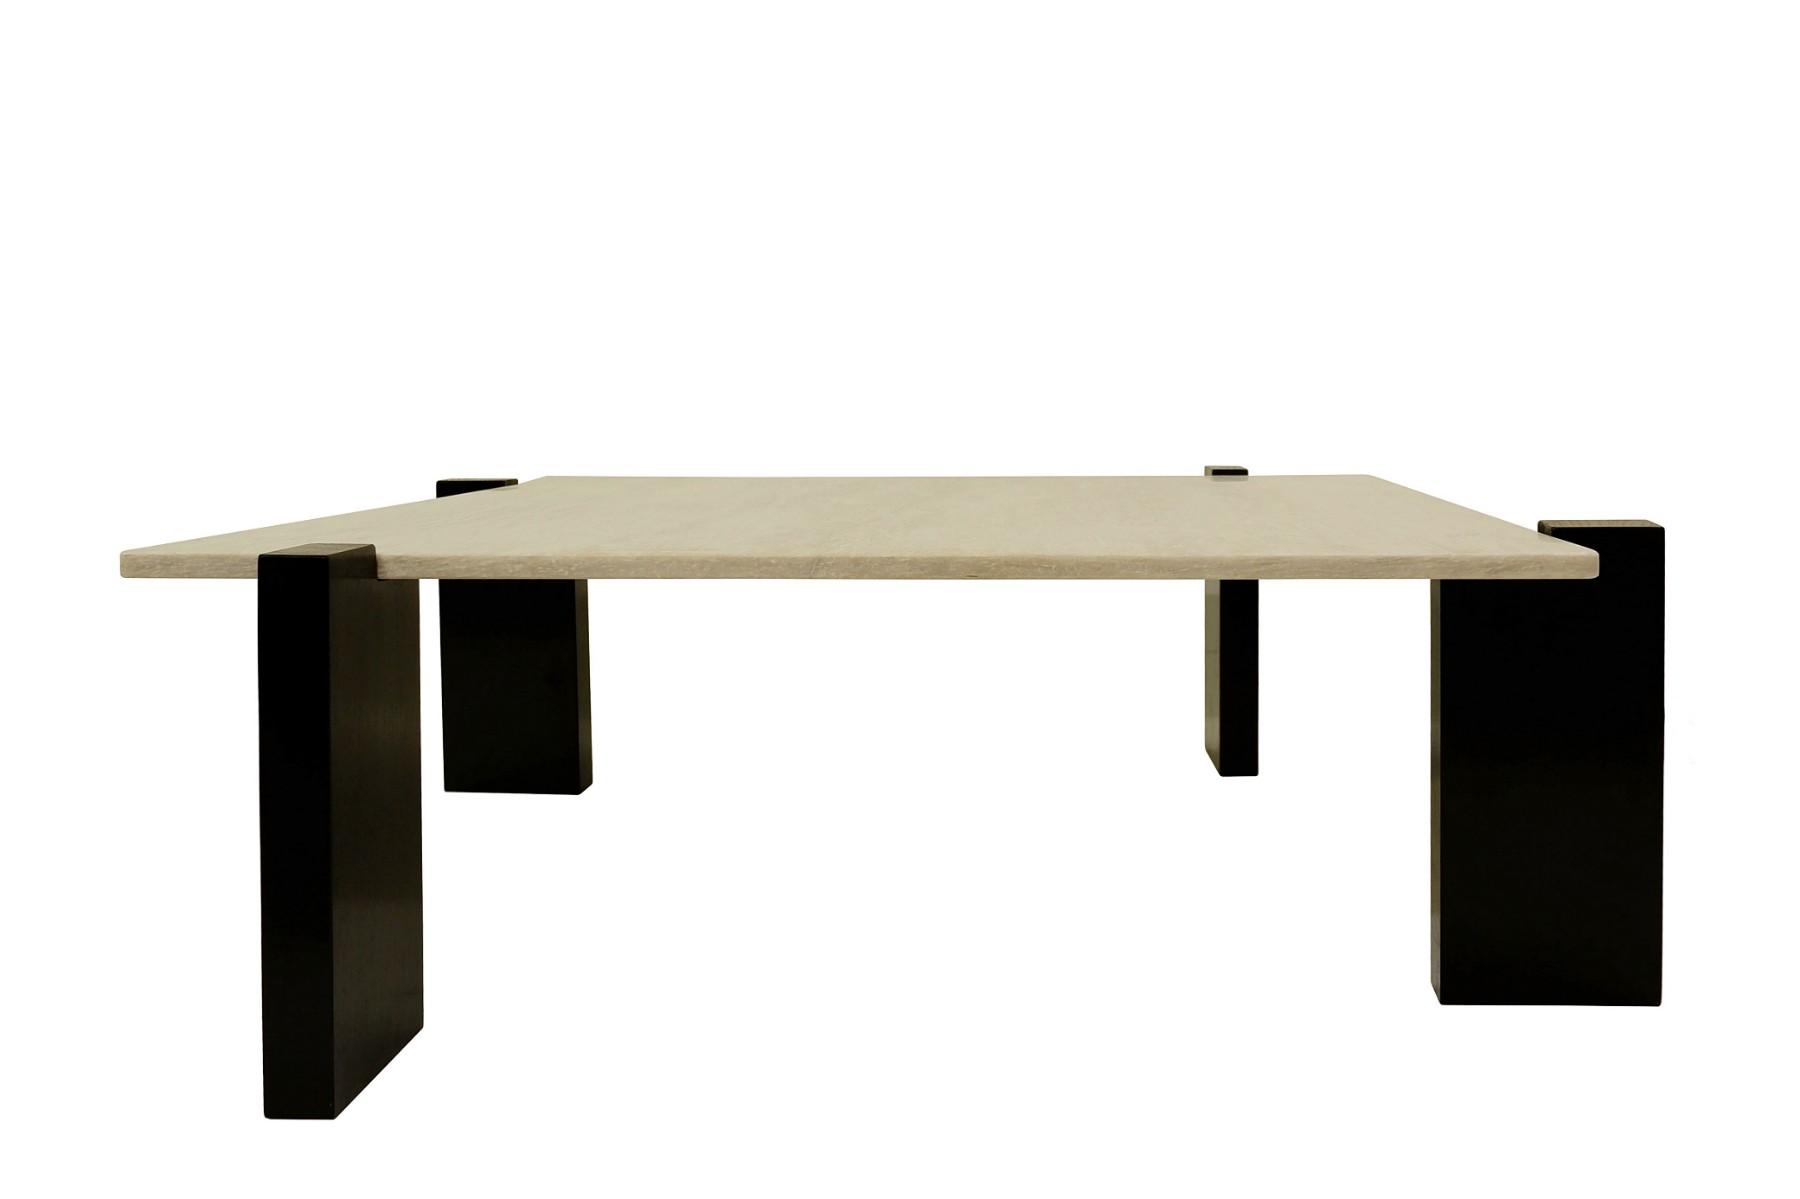 Remarkable Coffee Table By Oscar Niemeyer For Tepperman Brasile 1970S Machost Co Dining Chair Design Ideas Machostcouk